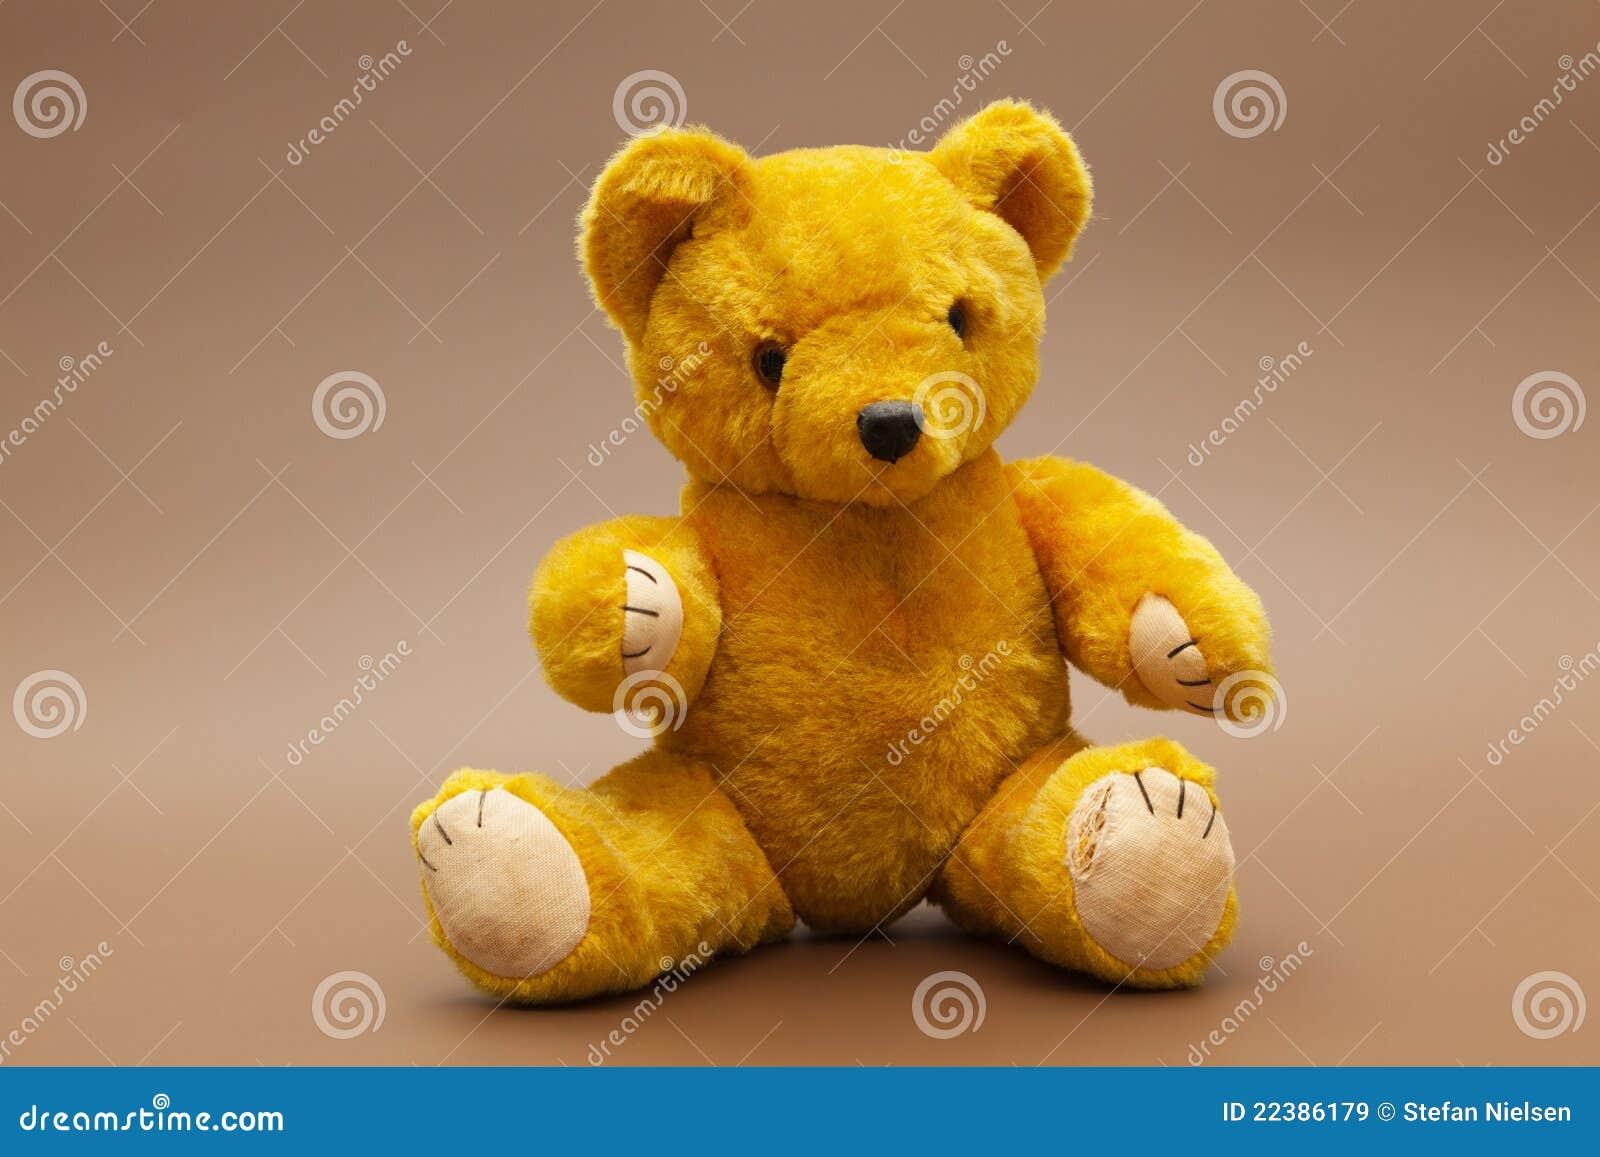 Teddybear amarillo